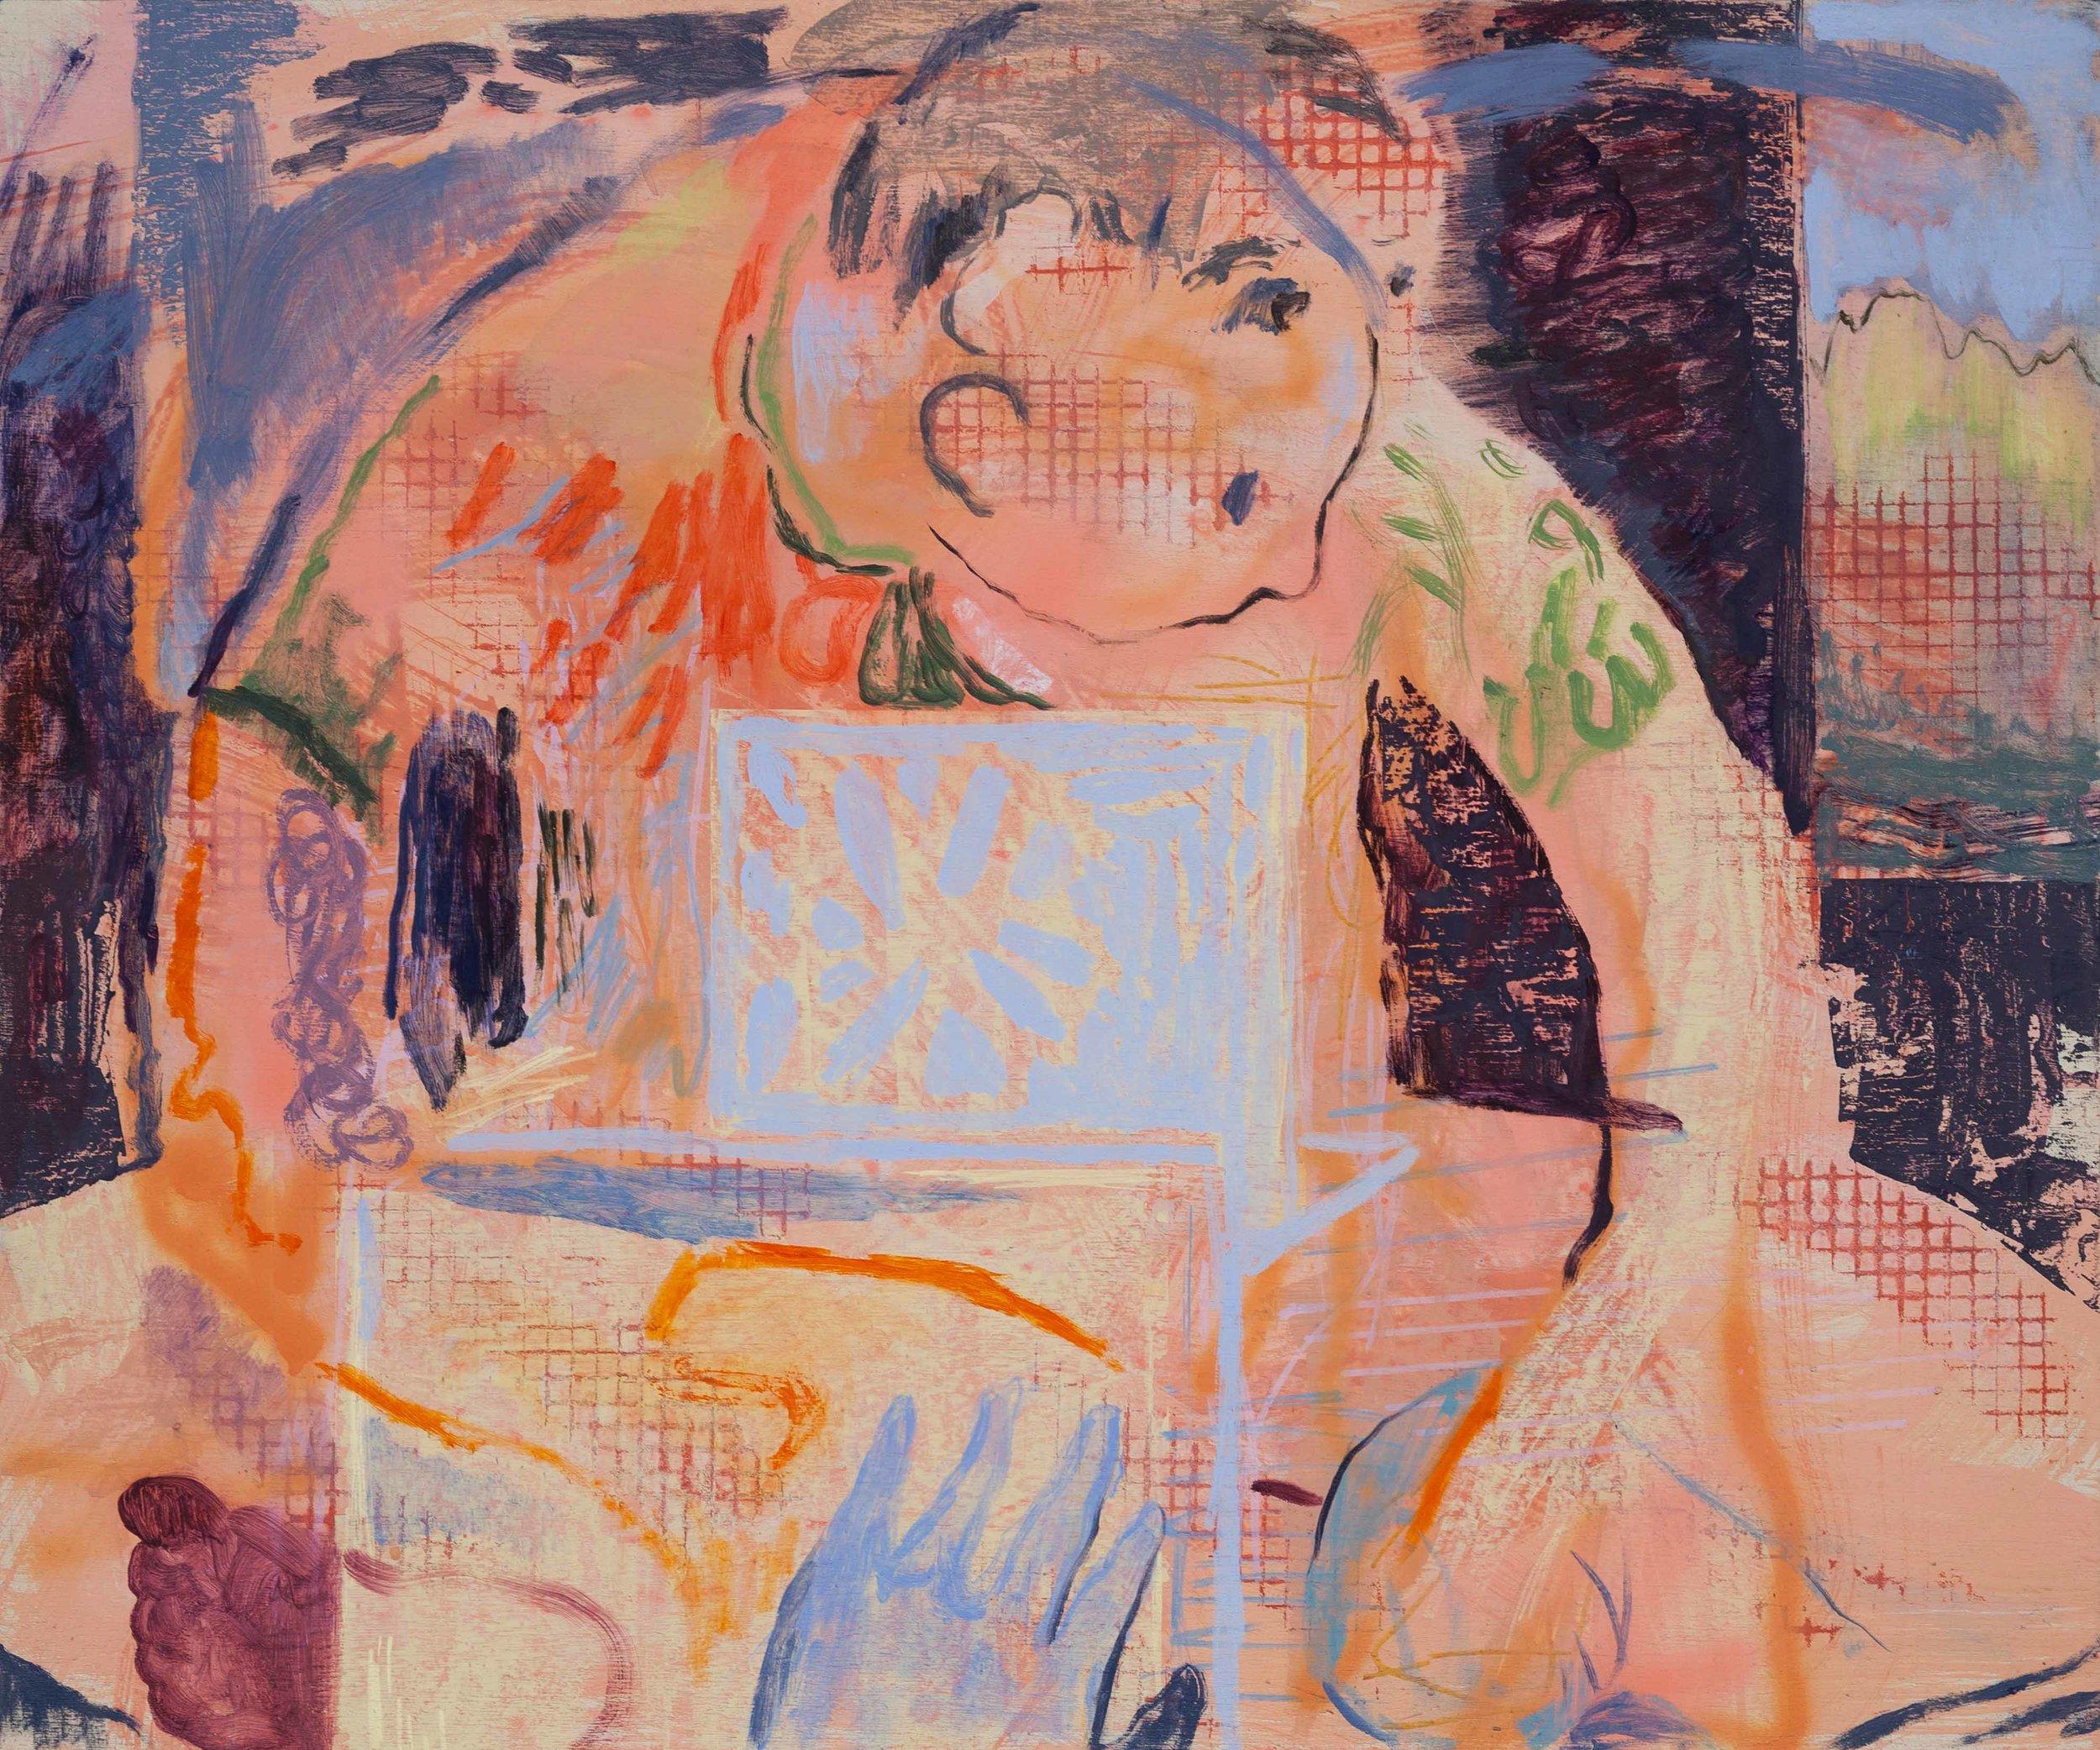 Laptop Portrait, Oil, Screen Print, Spray Paint, and Acrylic on Canvas, 2019.